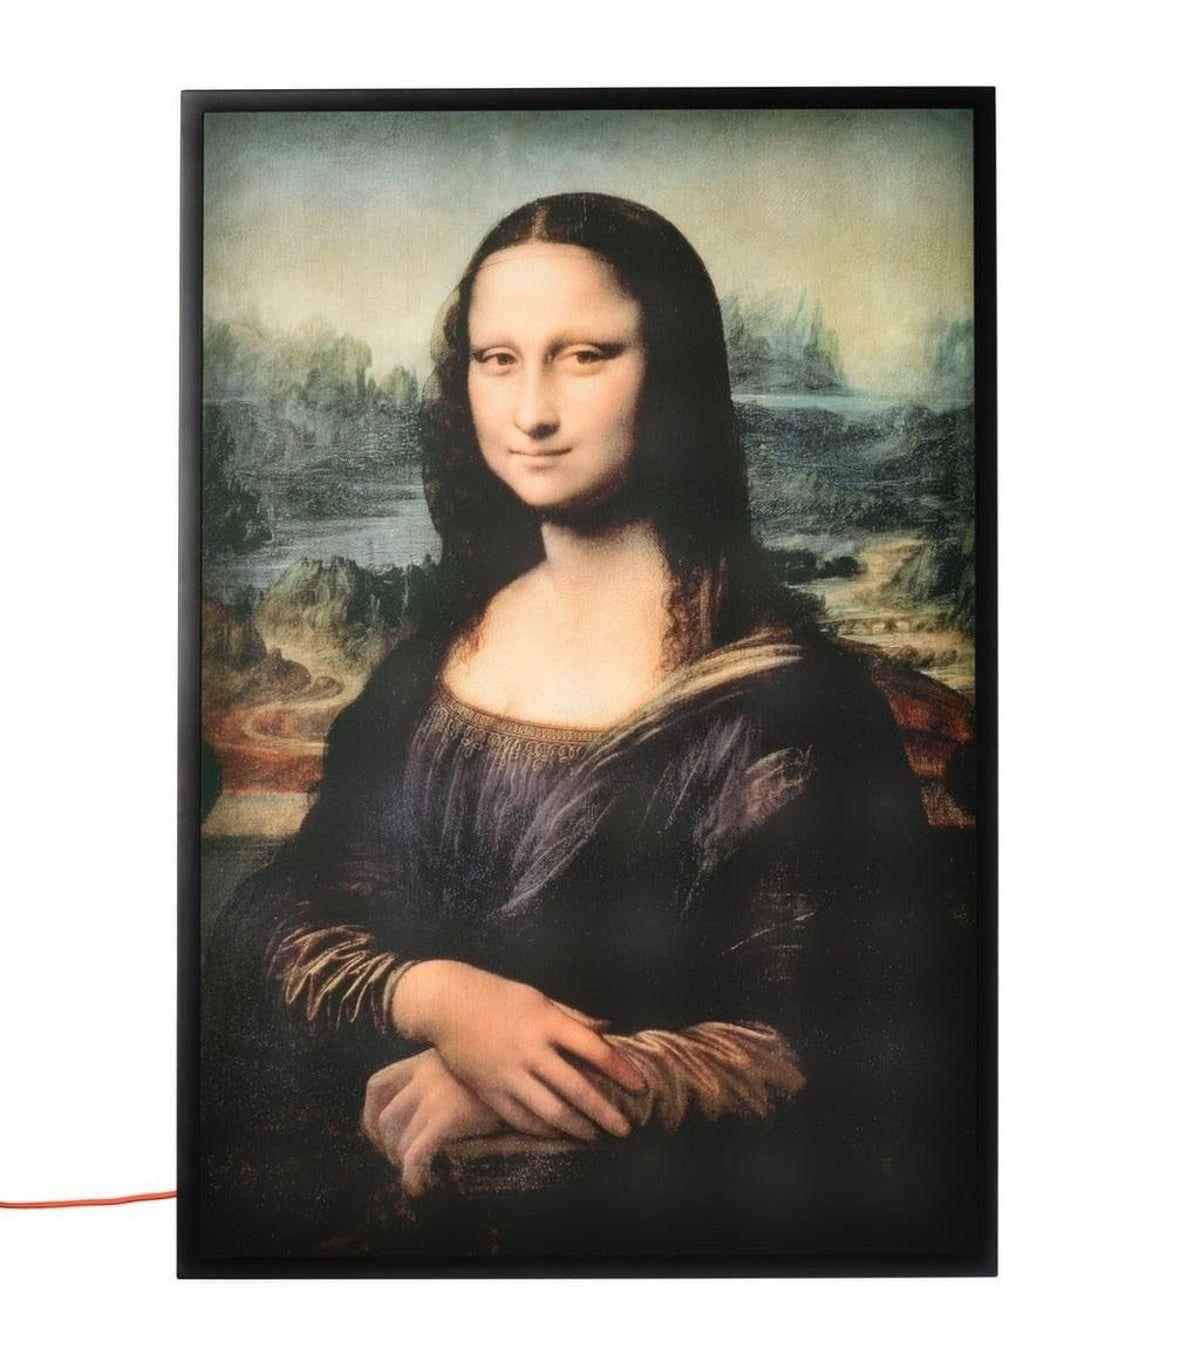 Ikea X Off White Backlit Artwork Mona L On Mercari Pinturas Renacentistas Renacentismo Pinturas